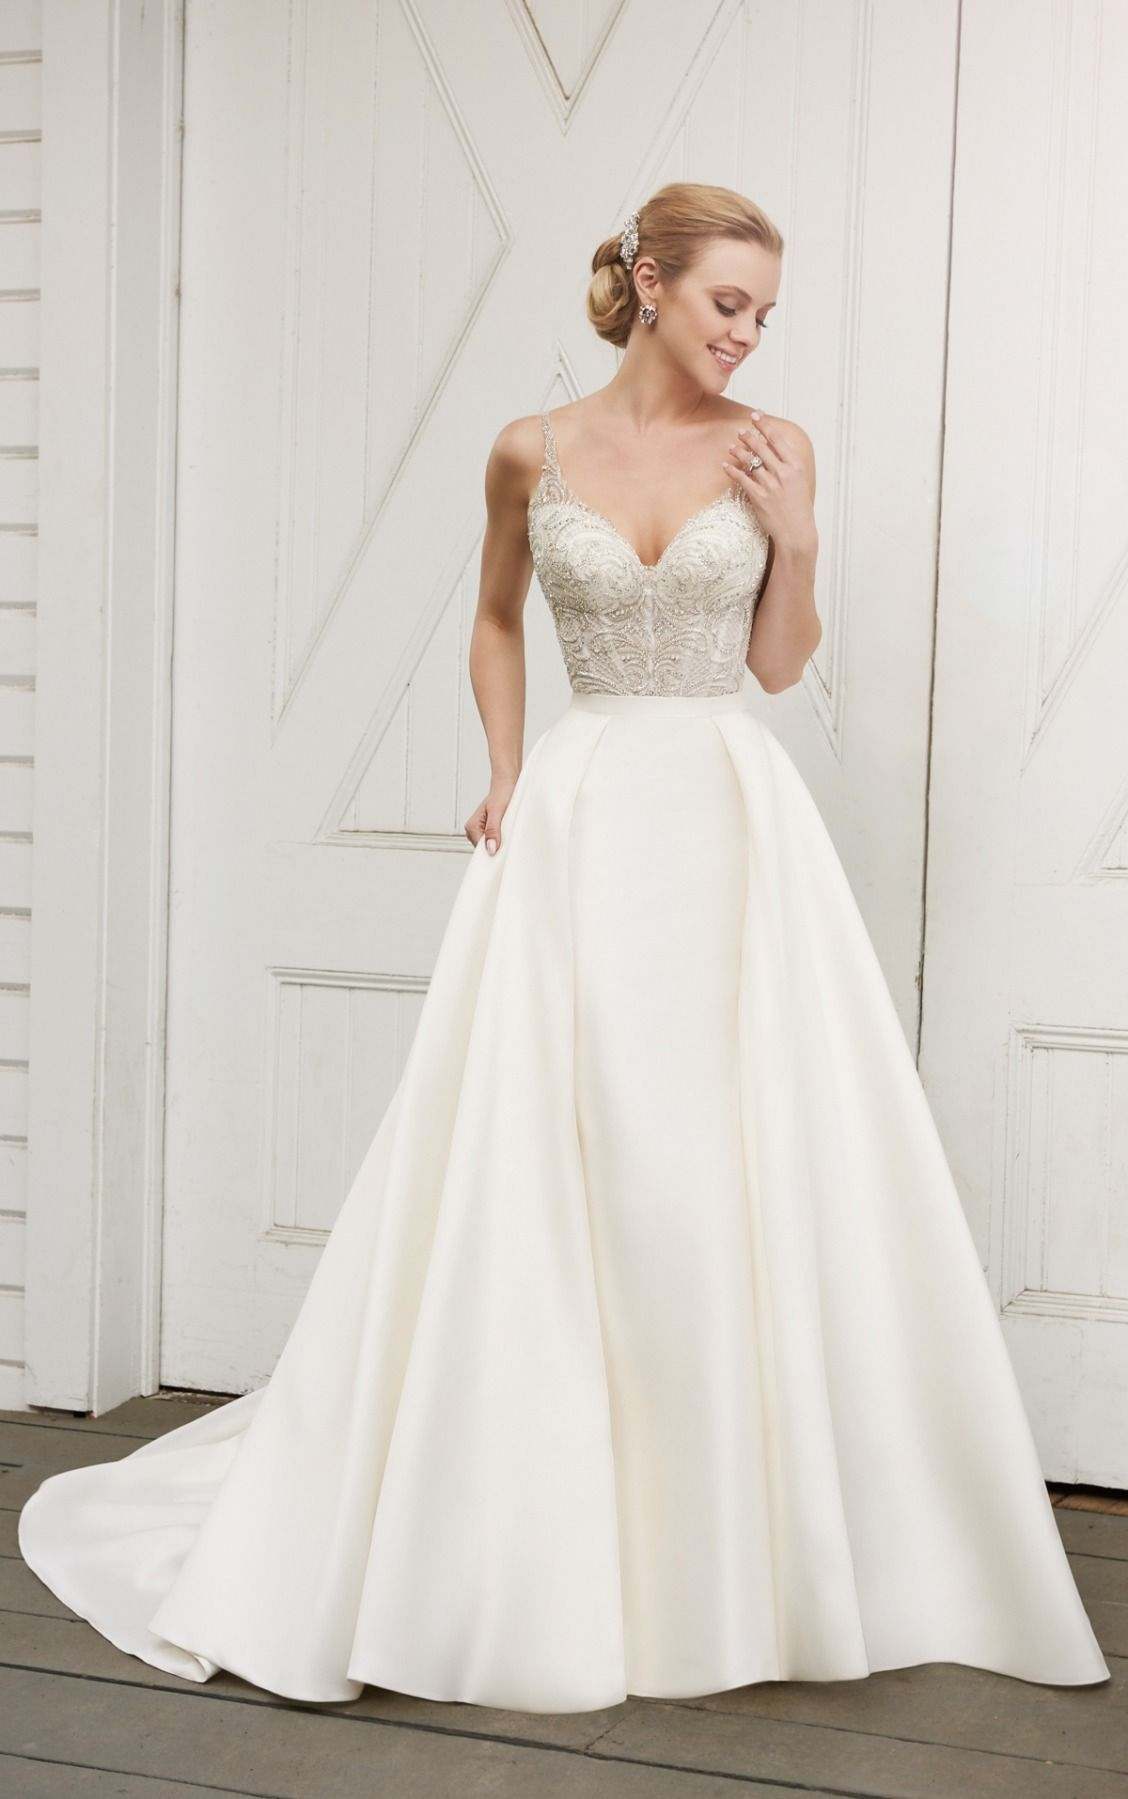 Wedding separates formal wedding dresses formal wedding and